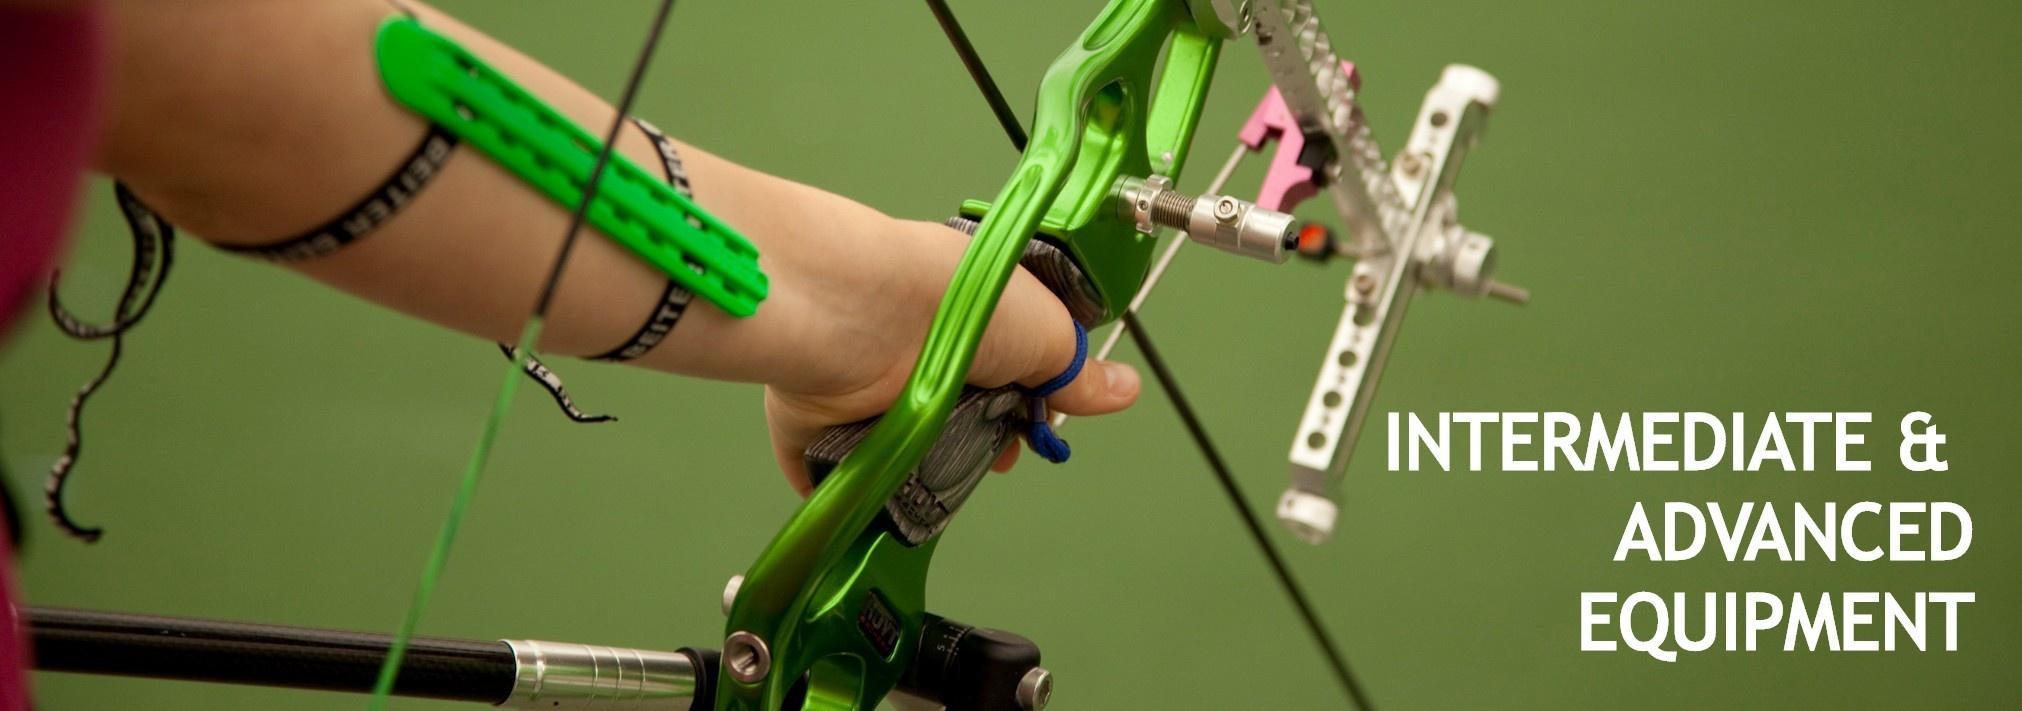 Intermediate & Advanced Recurve Bows